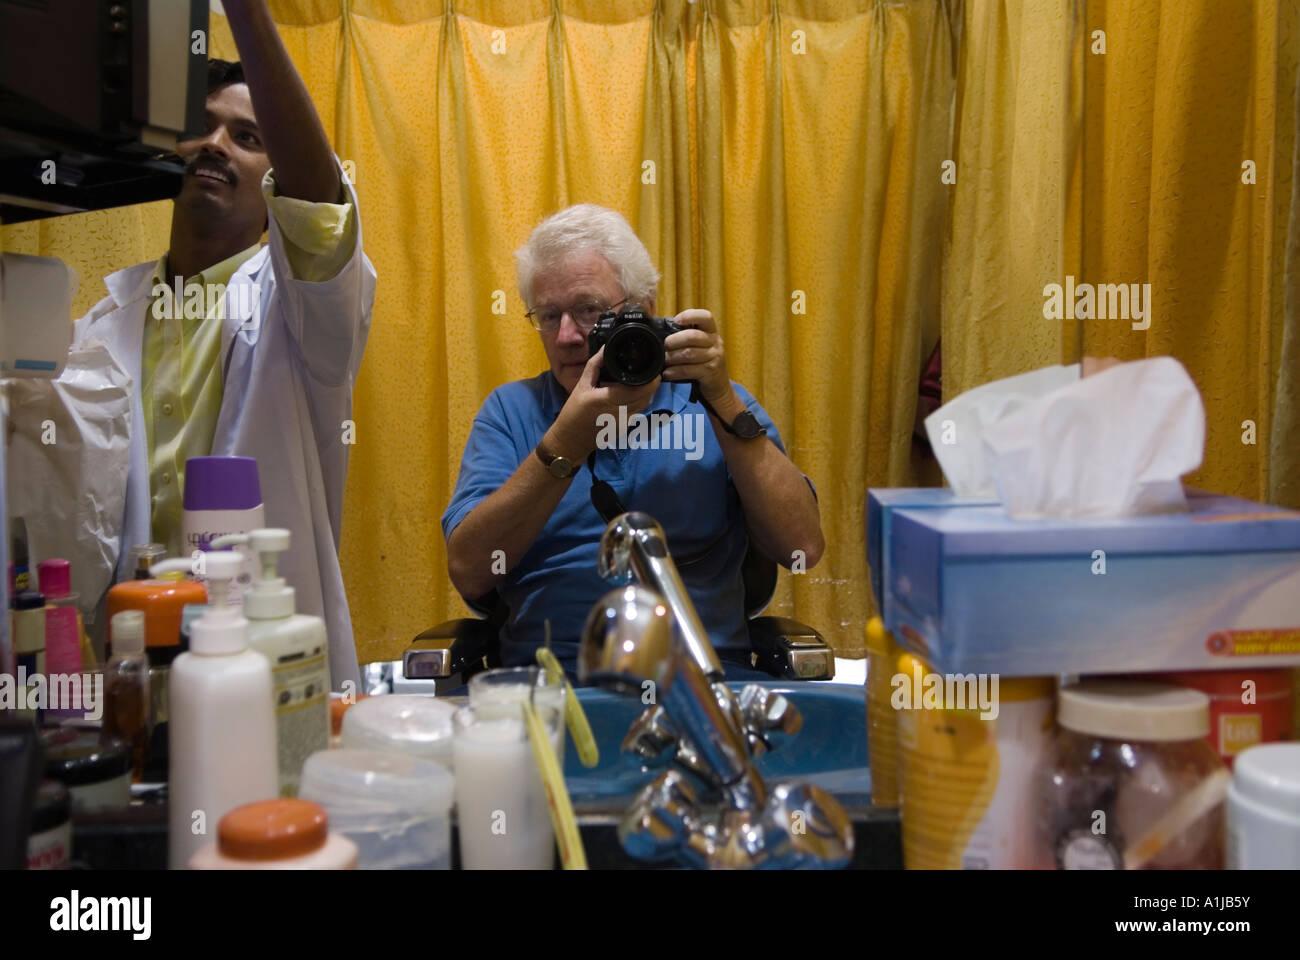 Abu Dhabi United Arab Emirates UAE Homer Sykes having a hair cut - Stock Image